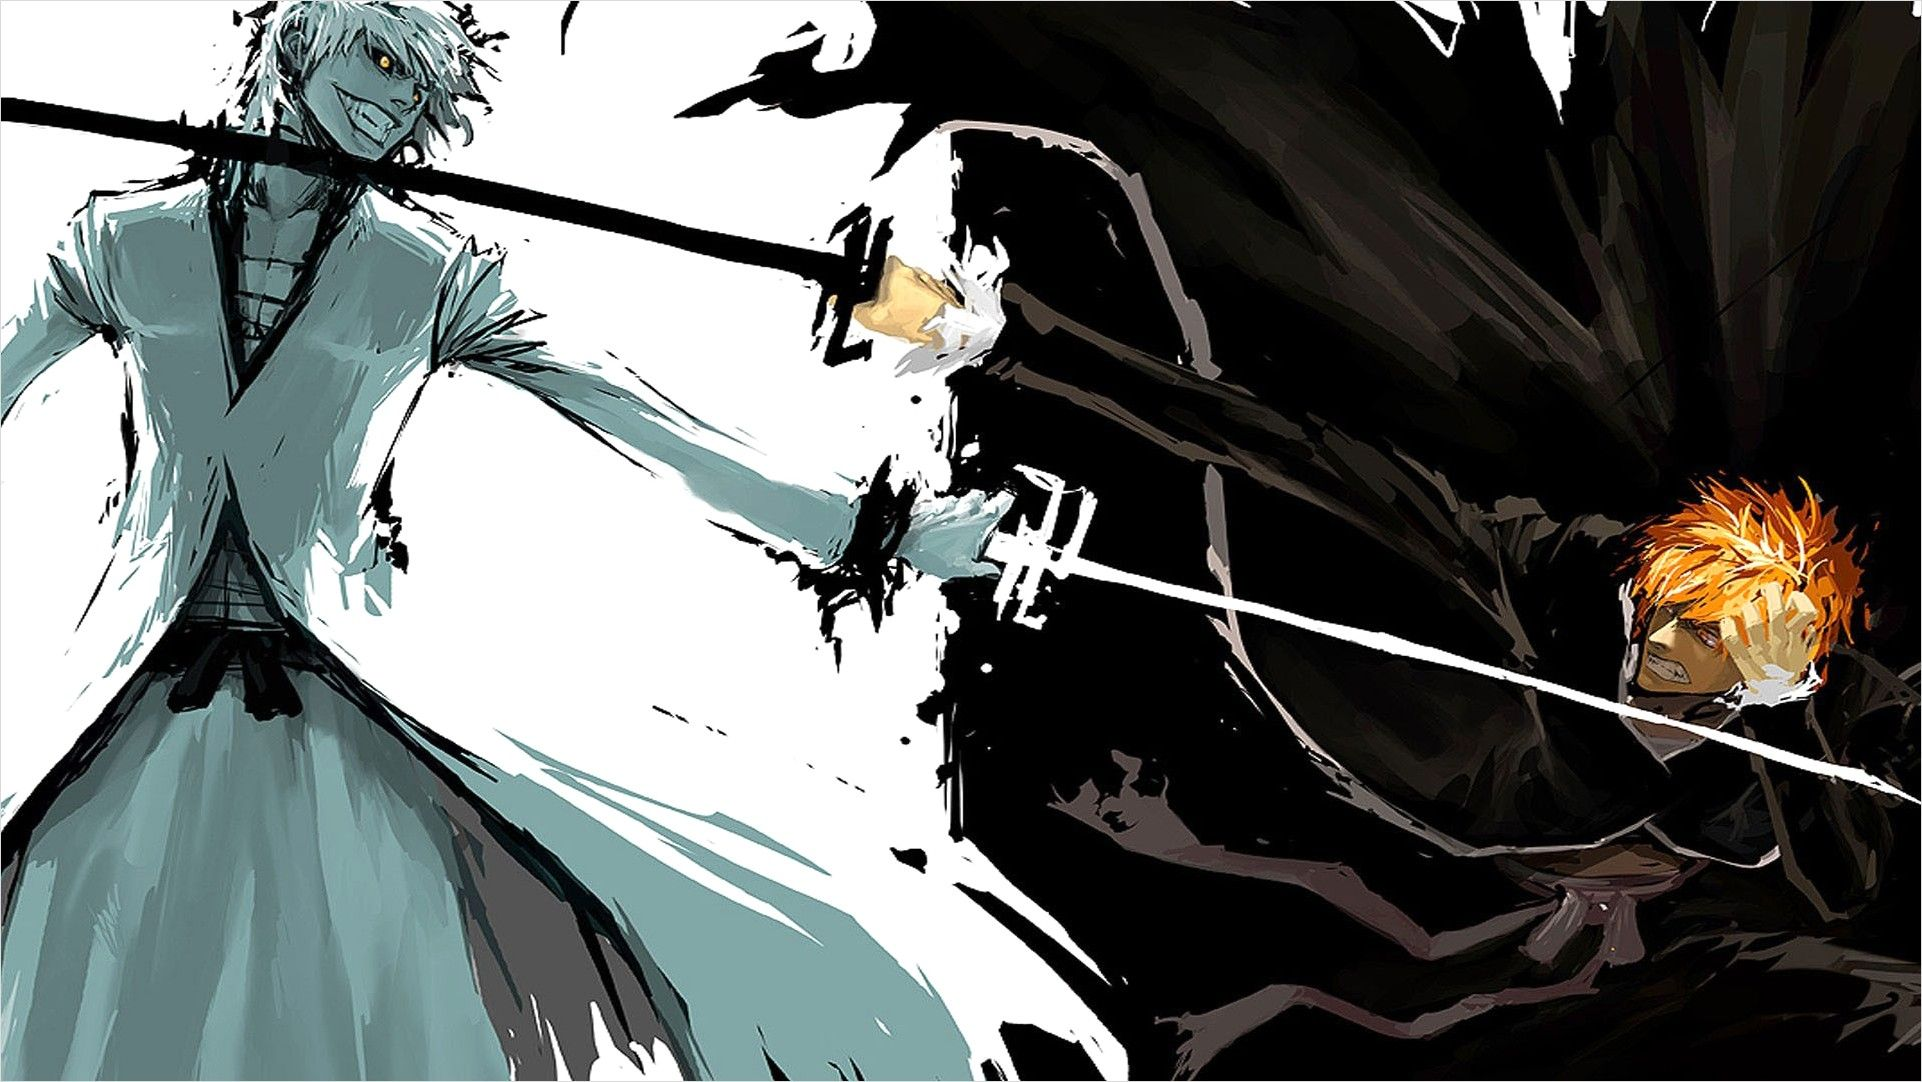 4k Bleach Wallpaper Ichigo Angry Neon In 2020 Bleach Anime Dark Anime Anime Wallpaper